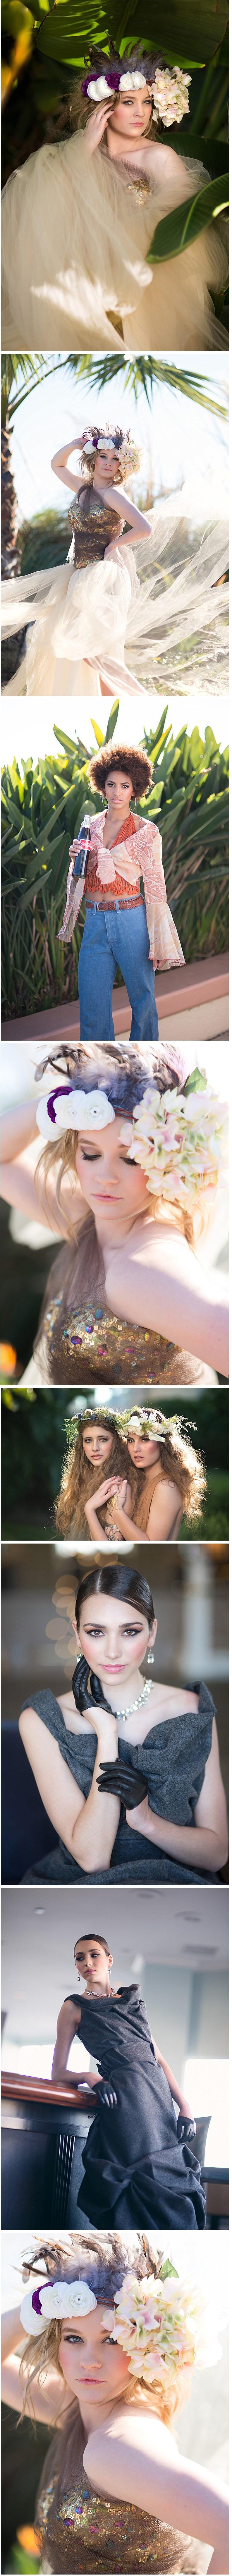 Conceptual styled senior photography shoot